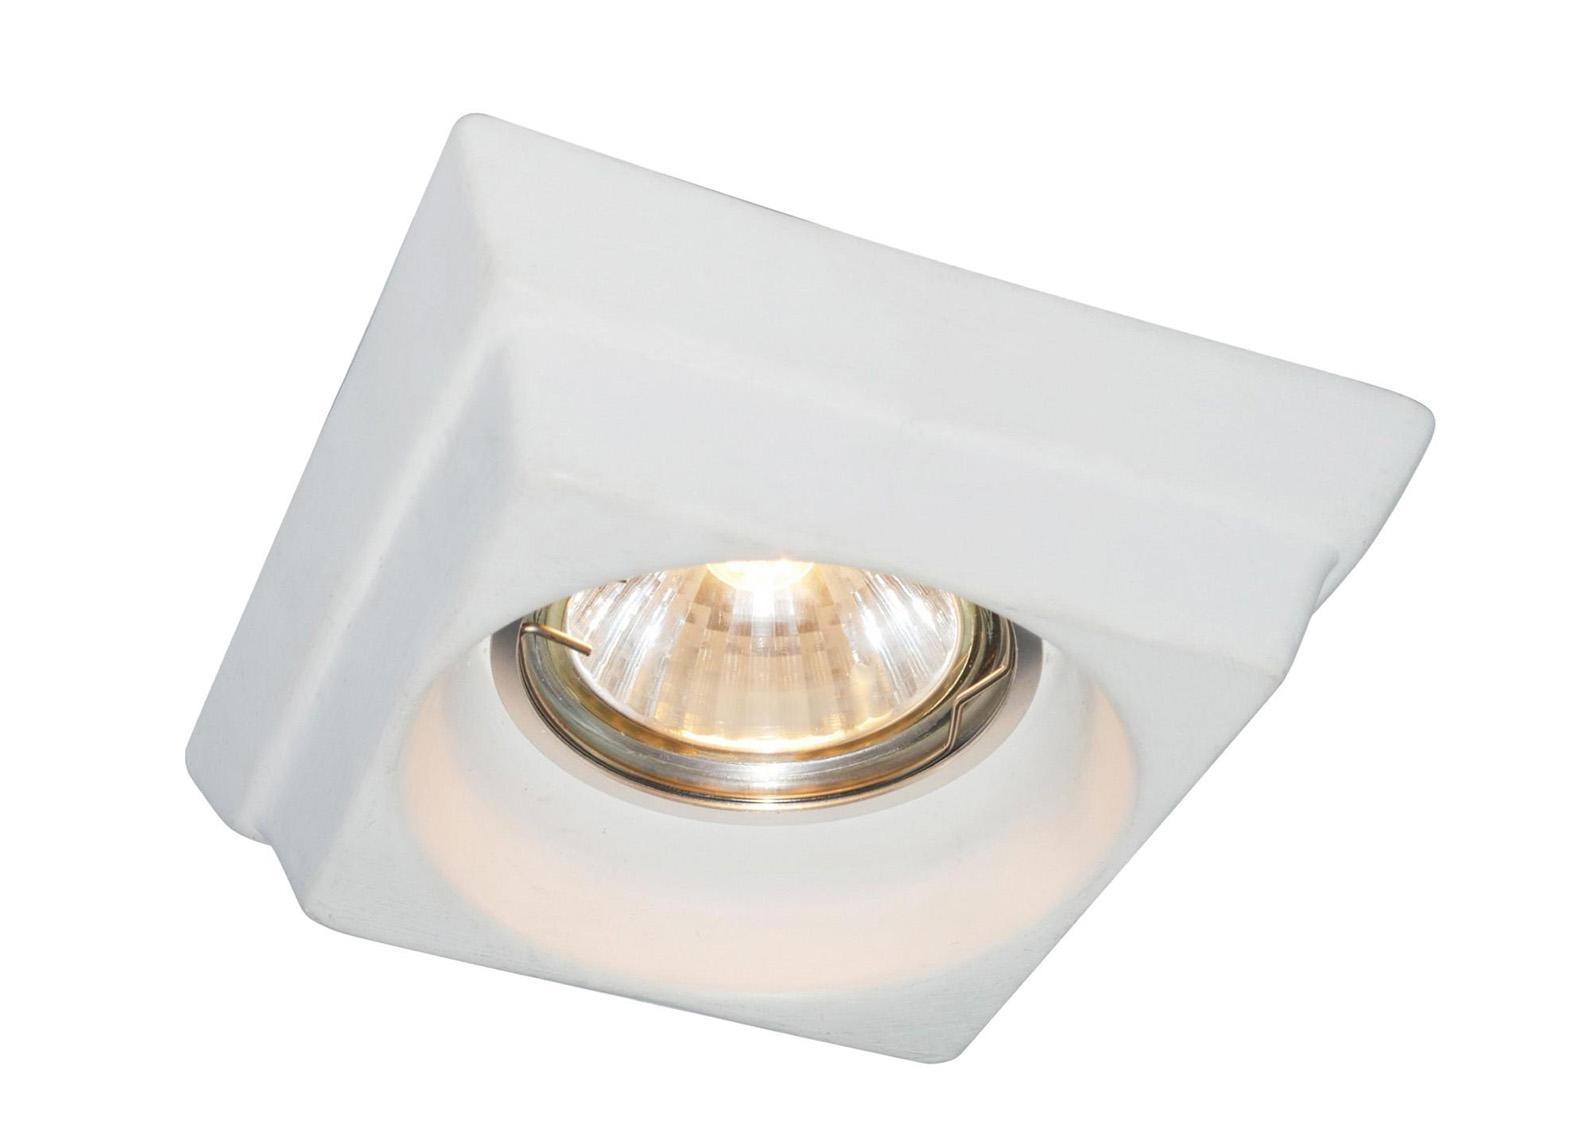 A5247PL-1WH CRATERE Встраиваемый светильникA5247PL-1WH1x50W; патроны GU10 и G5,3 в комплекте Материал: Арматура: КерамикаРазмер: 101x101x48Цвет: Белый